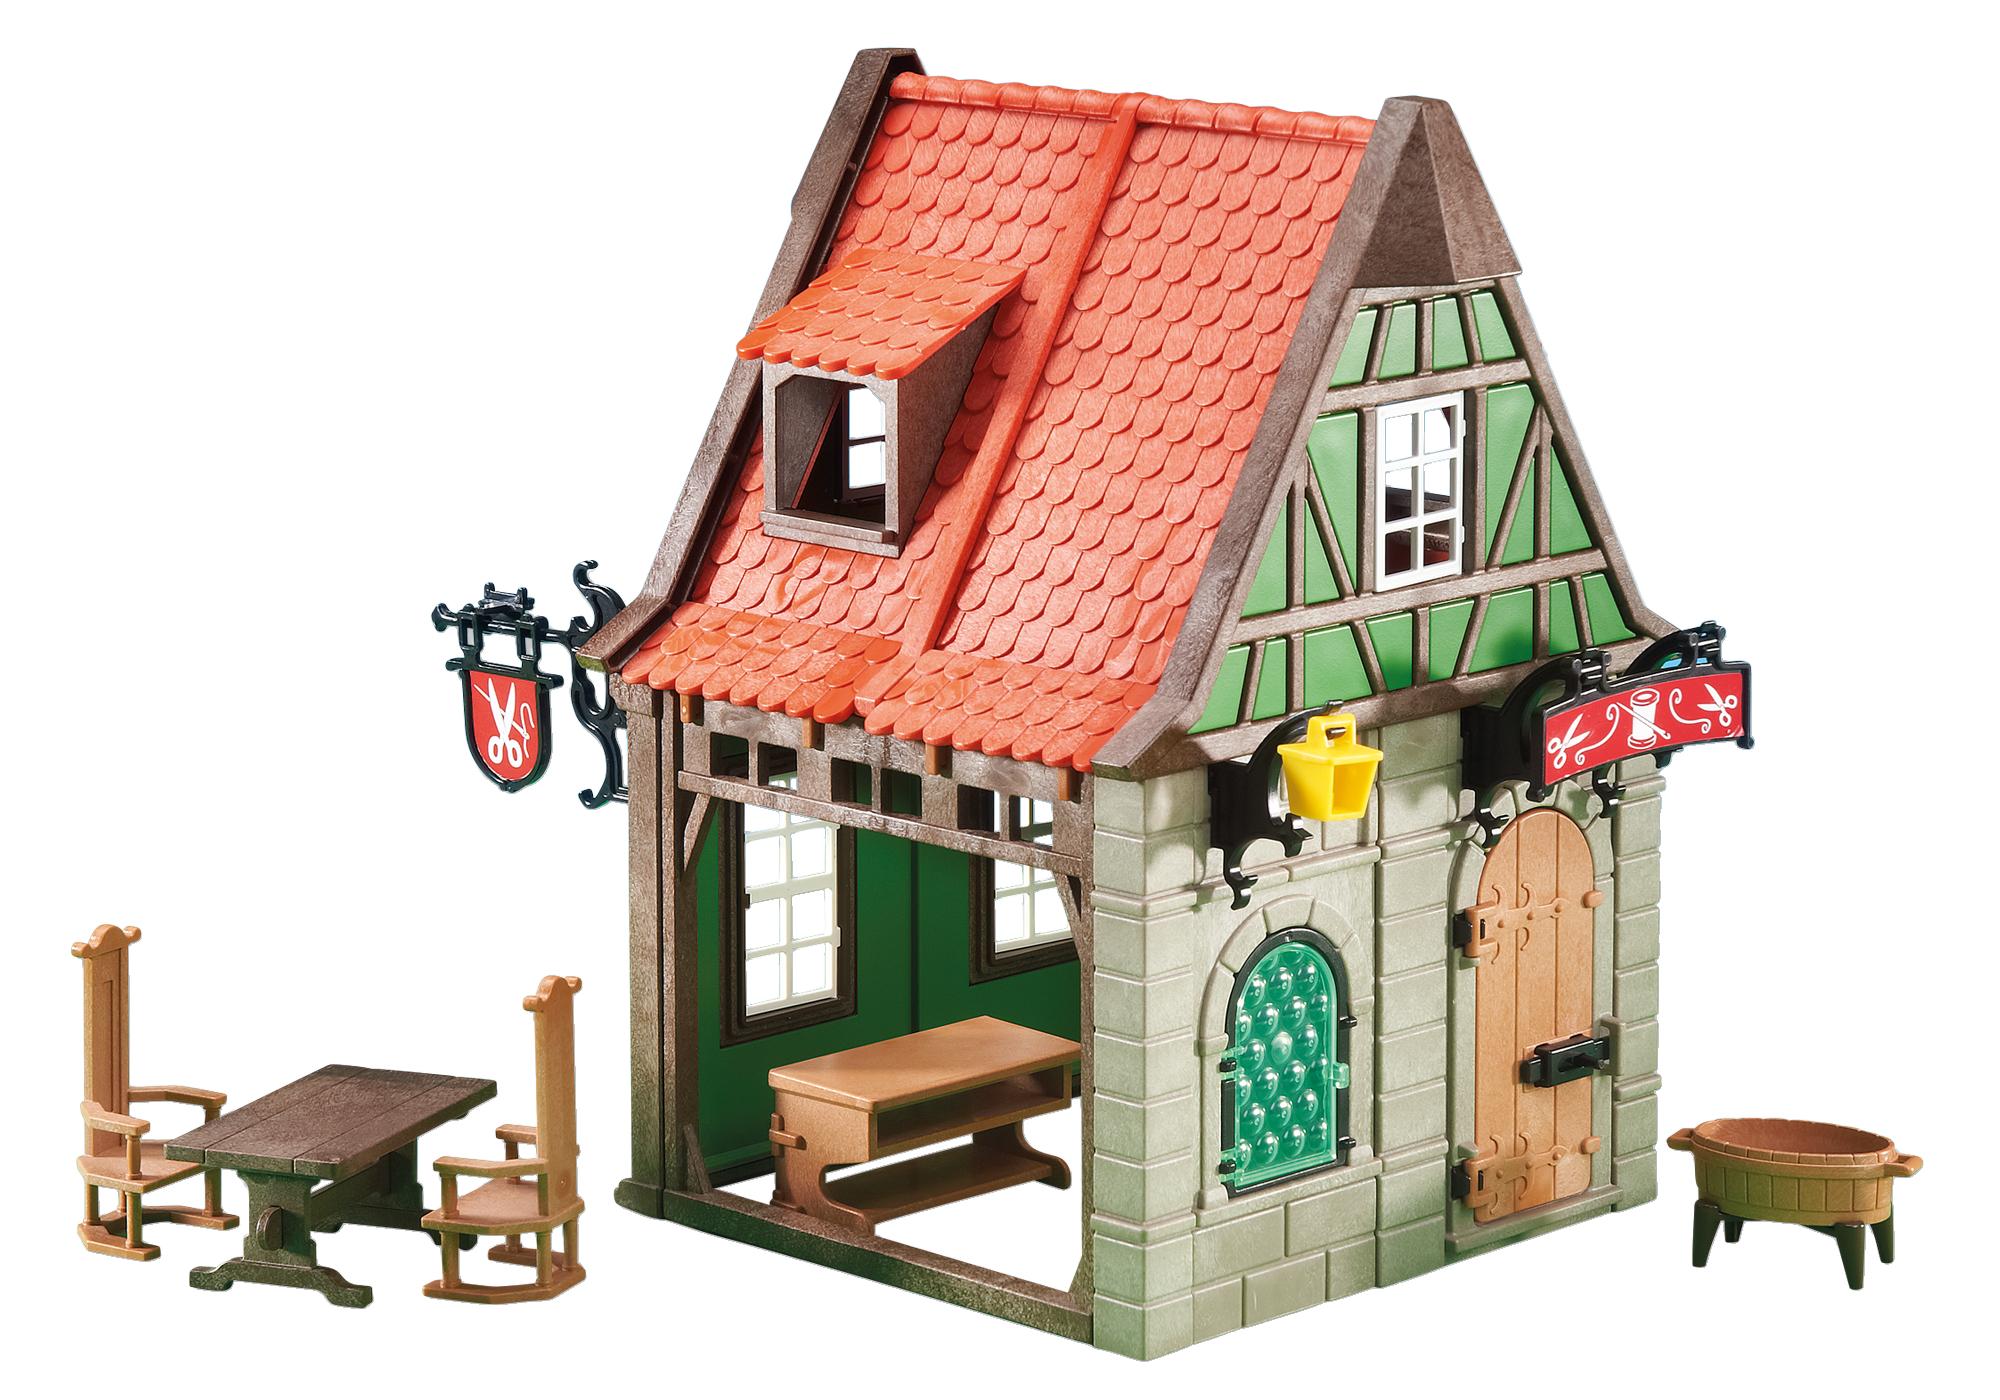 http://media.playmobil.com/i/playmobil/6463_product_detail/Historische Schneiderei